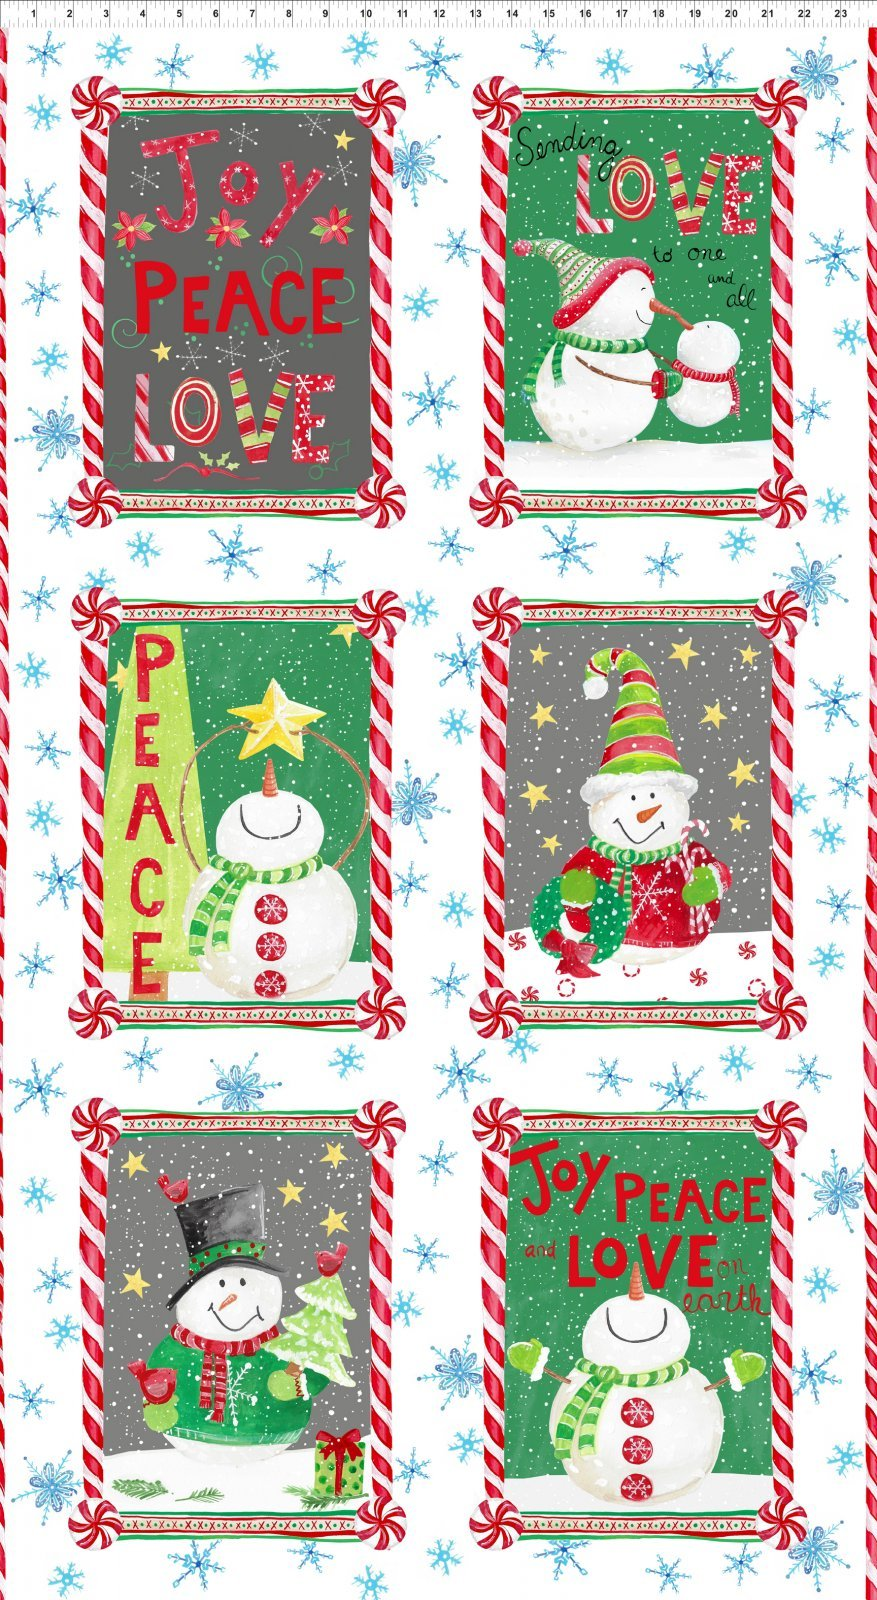 Joy, Peace and Love Panel